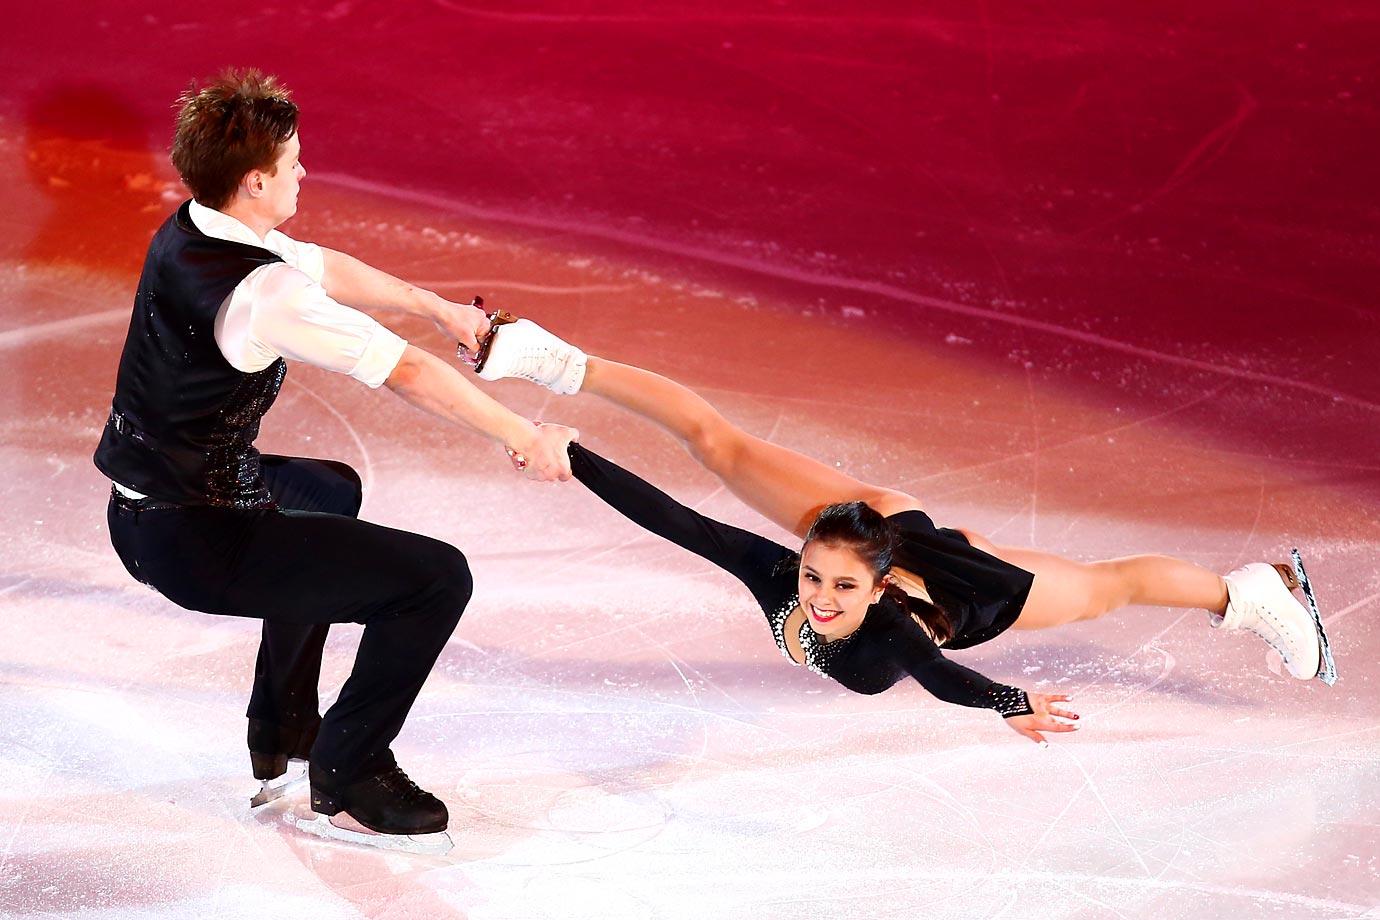 Maxim Miroshkin and Lina Fedorova of Russia perform during the Gala Exhibition of the ISU World Junior Figure Skating Championships. That has to hurt.